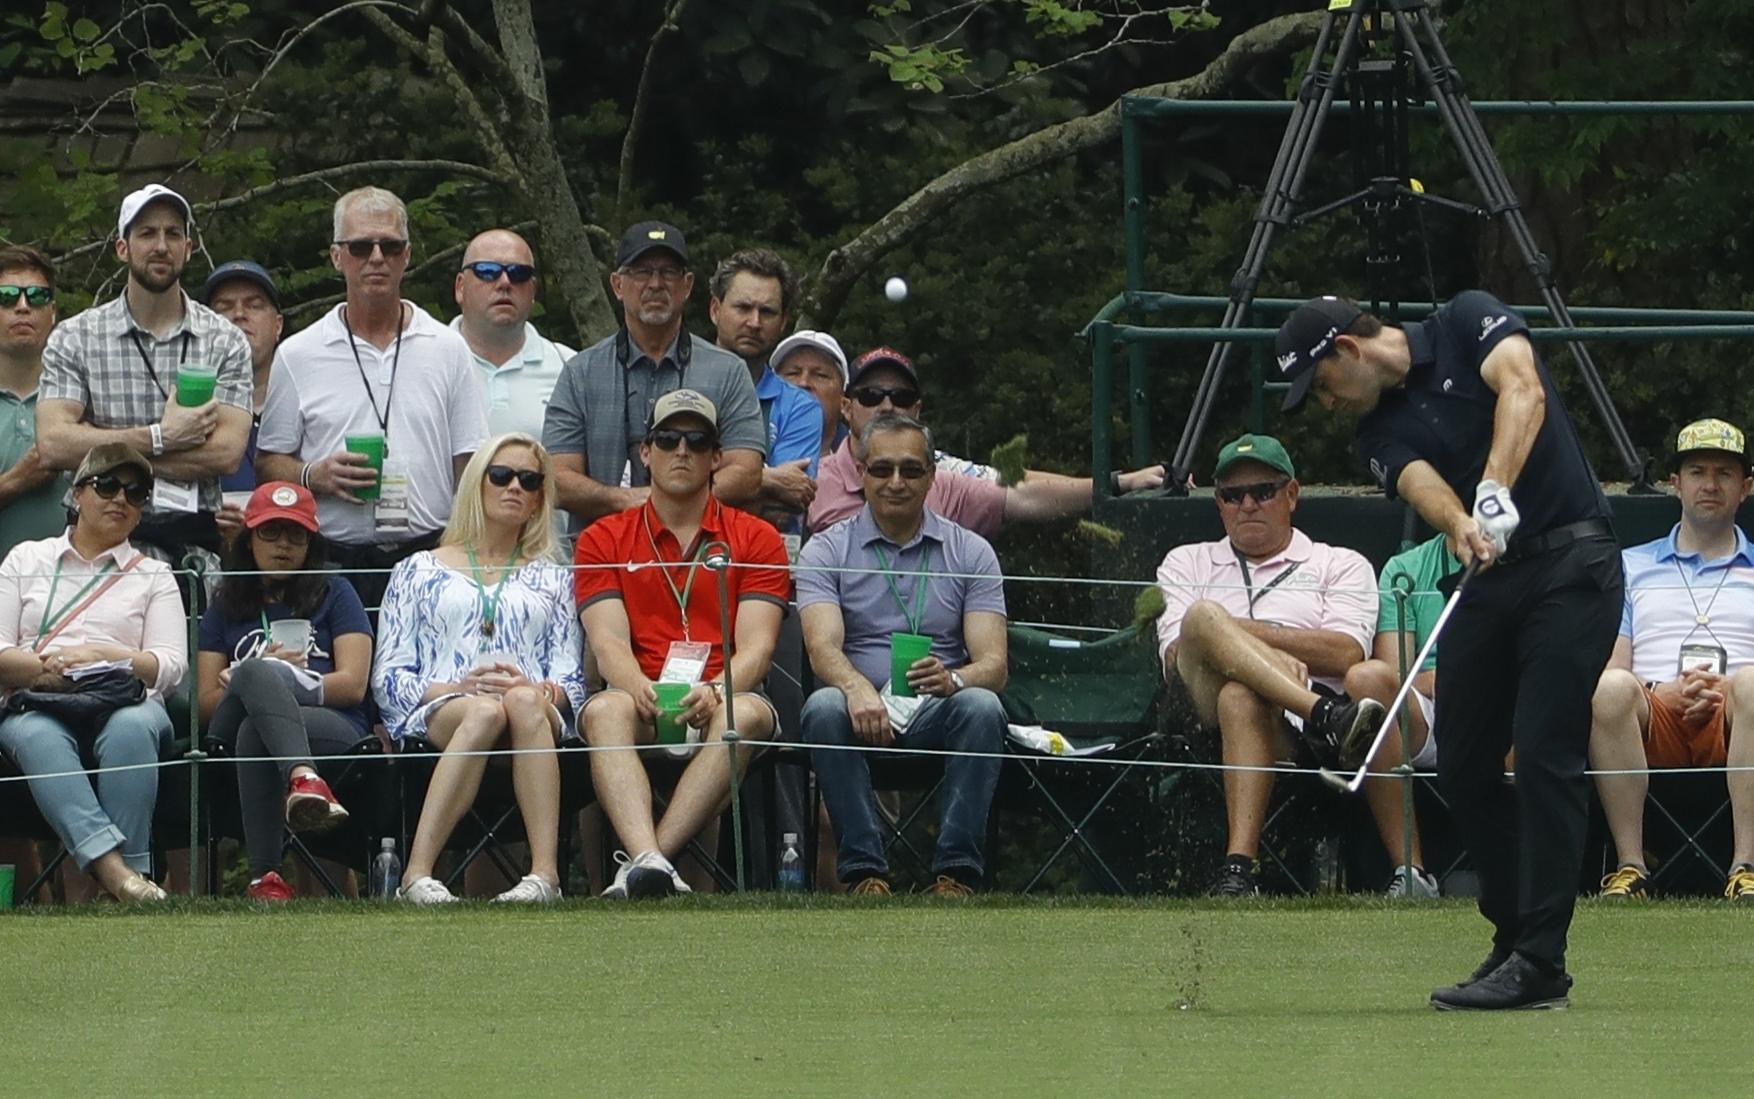 Masters_Golf_32886-159532.jpg78401967